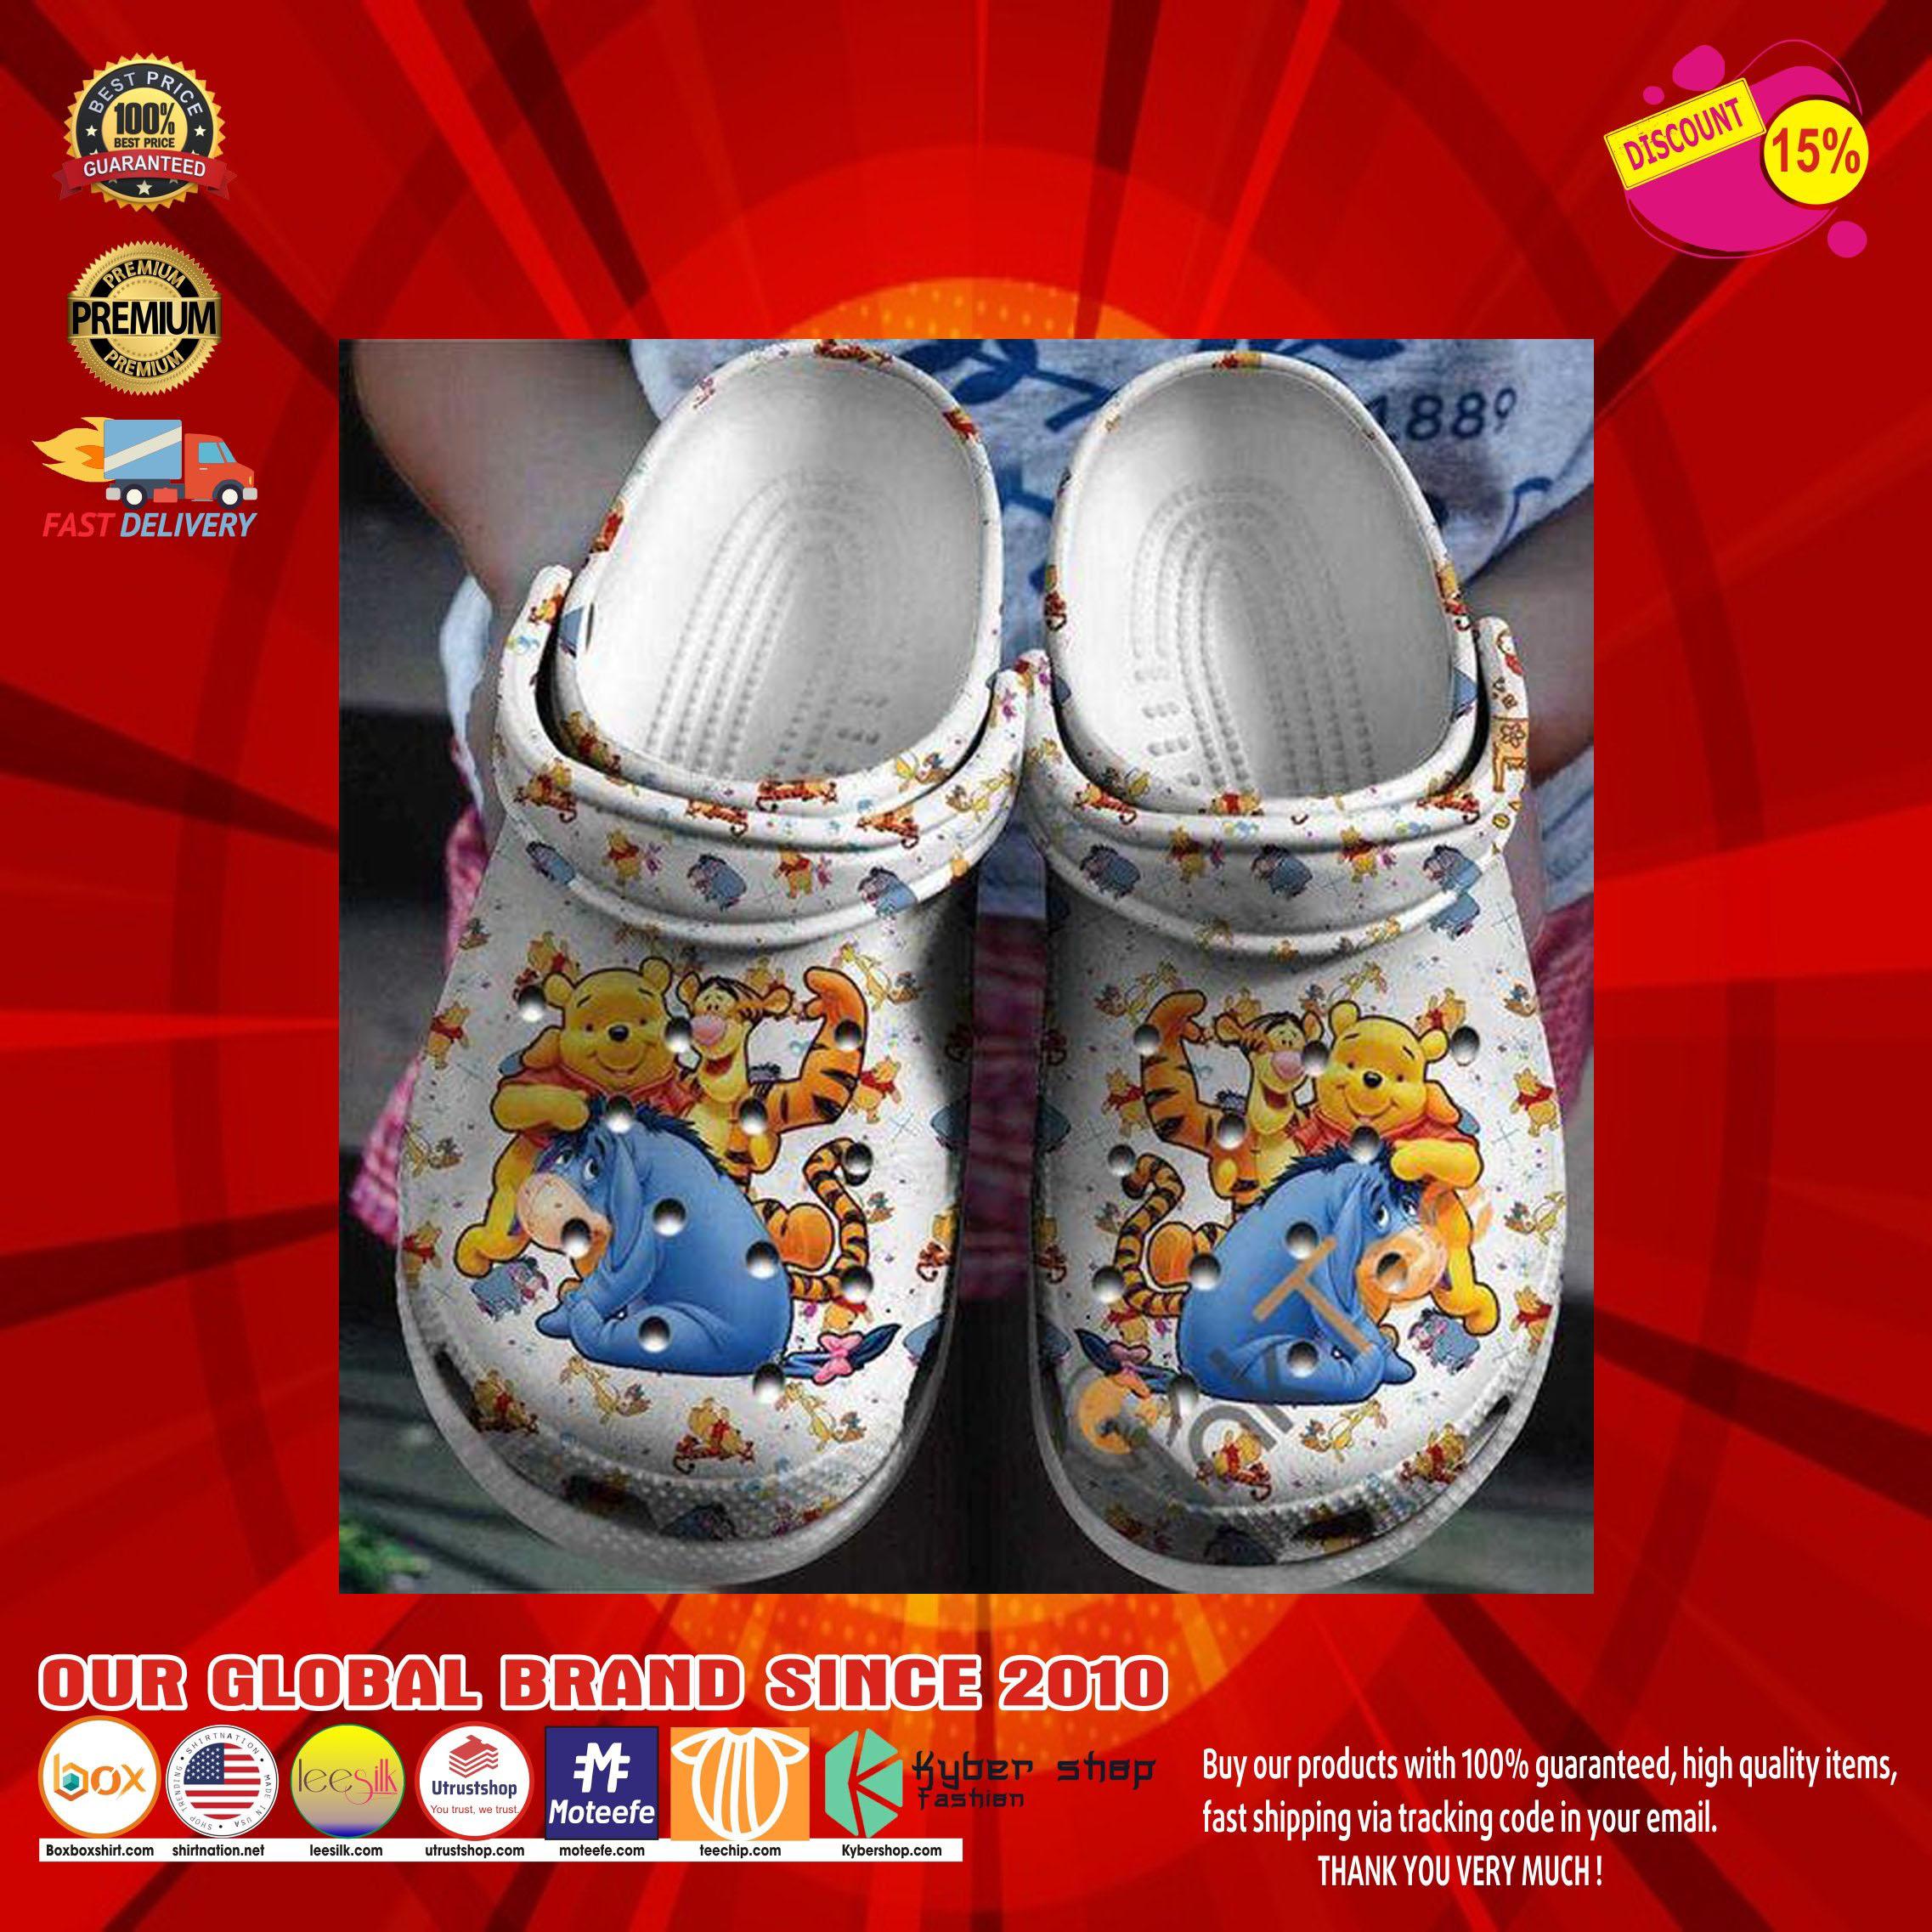 Winnie the pooh crocs clog shoes11